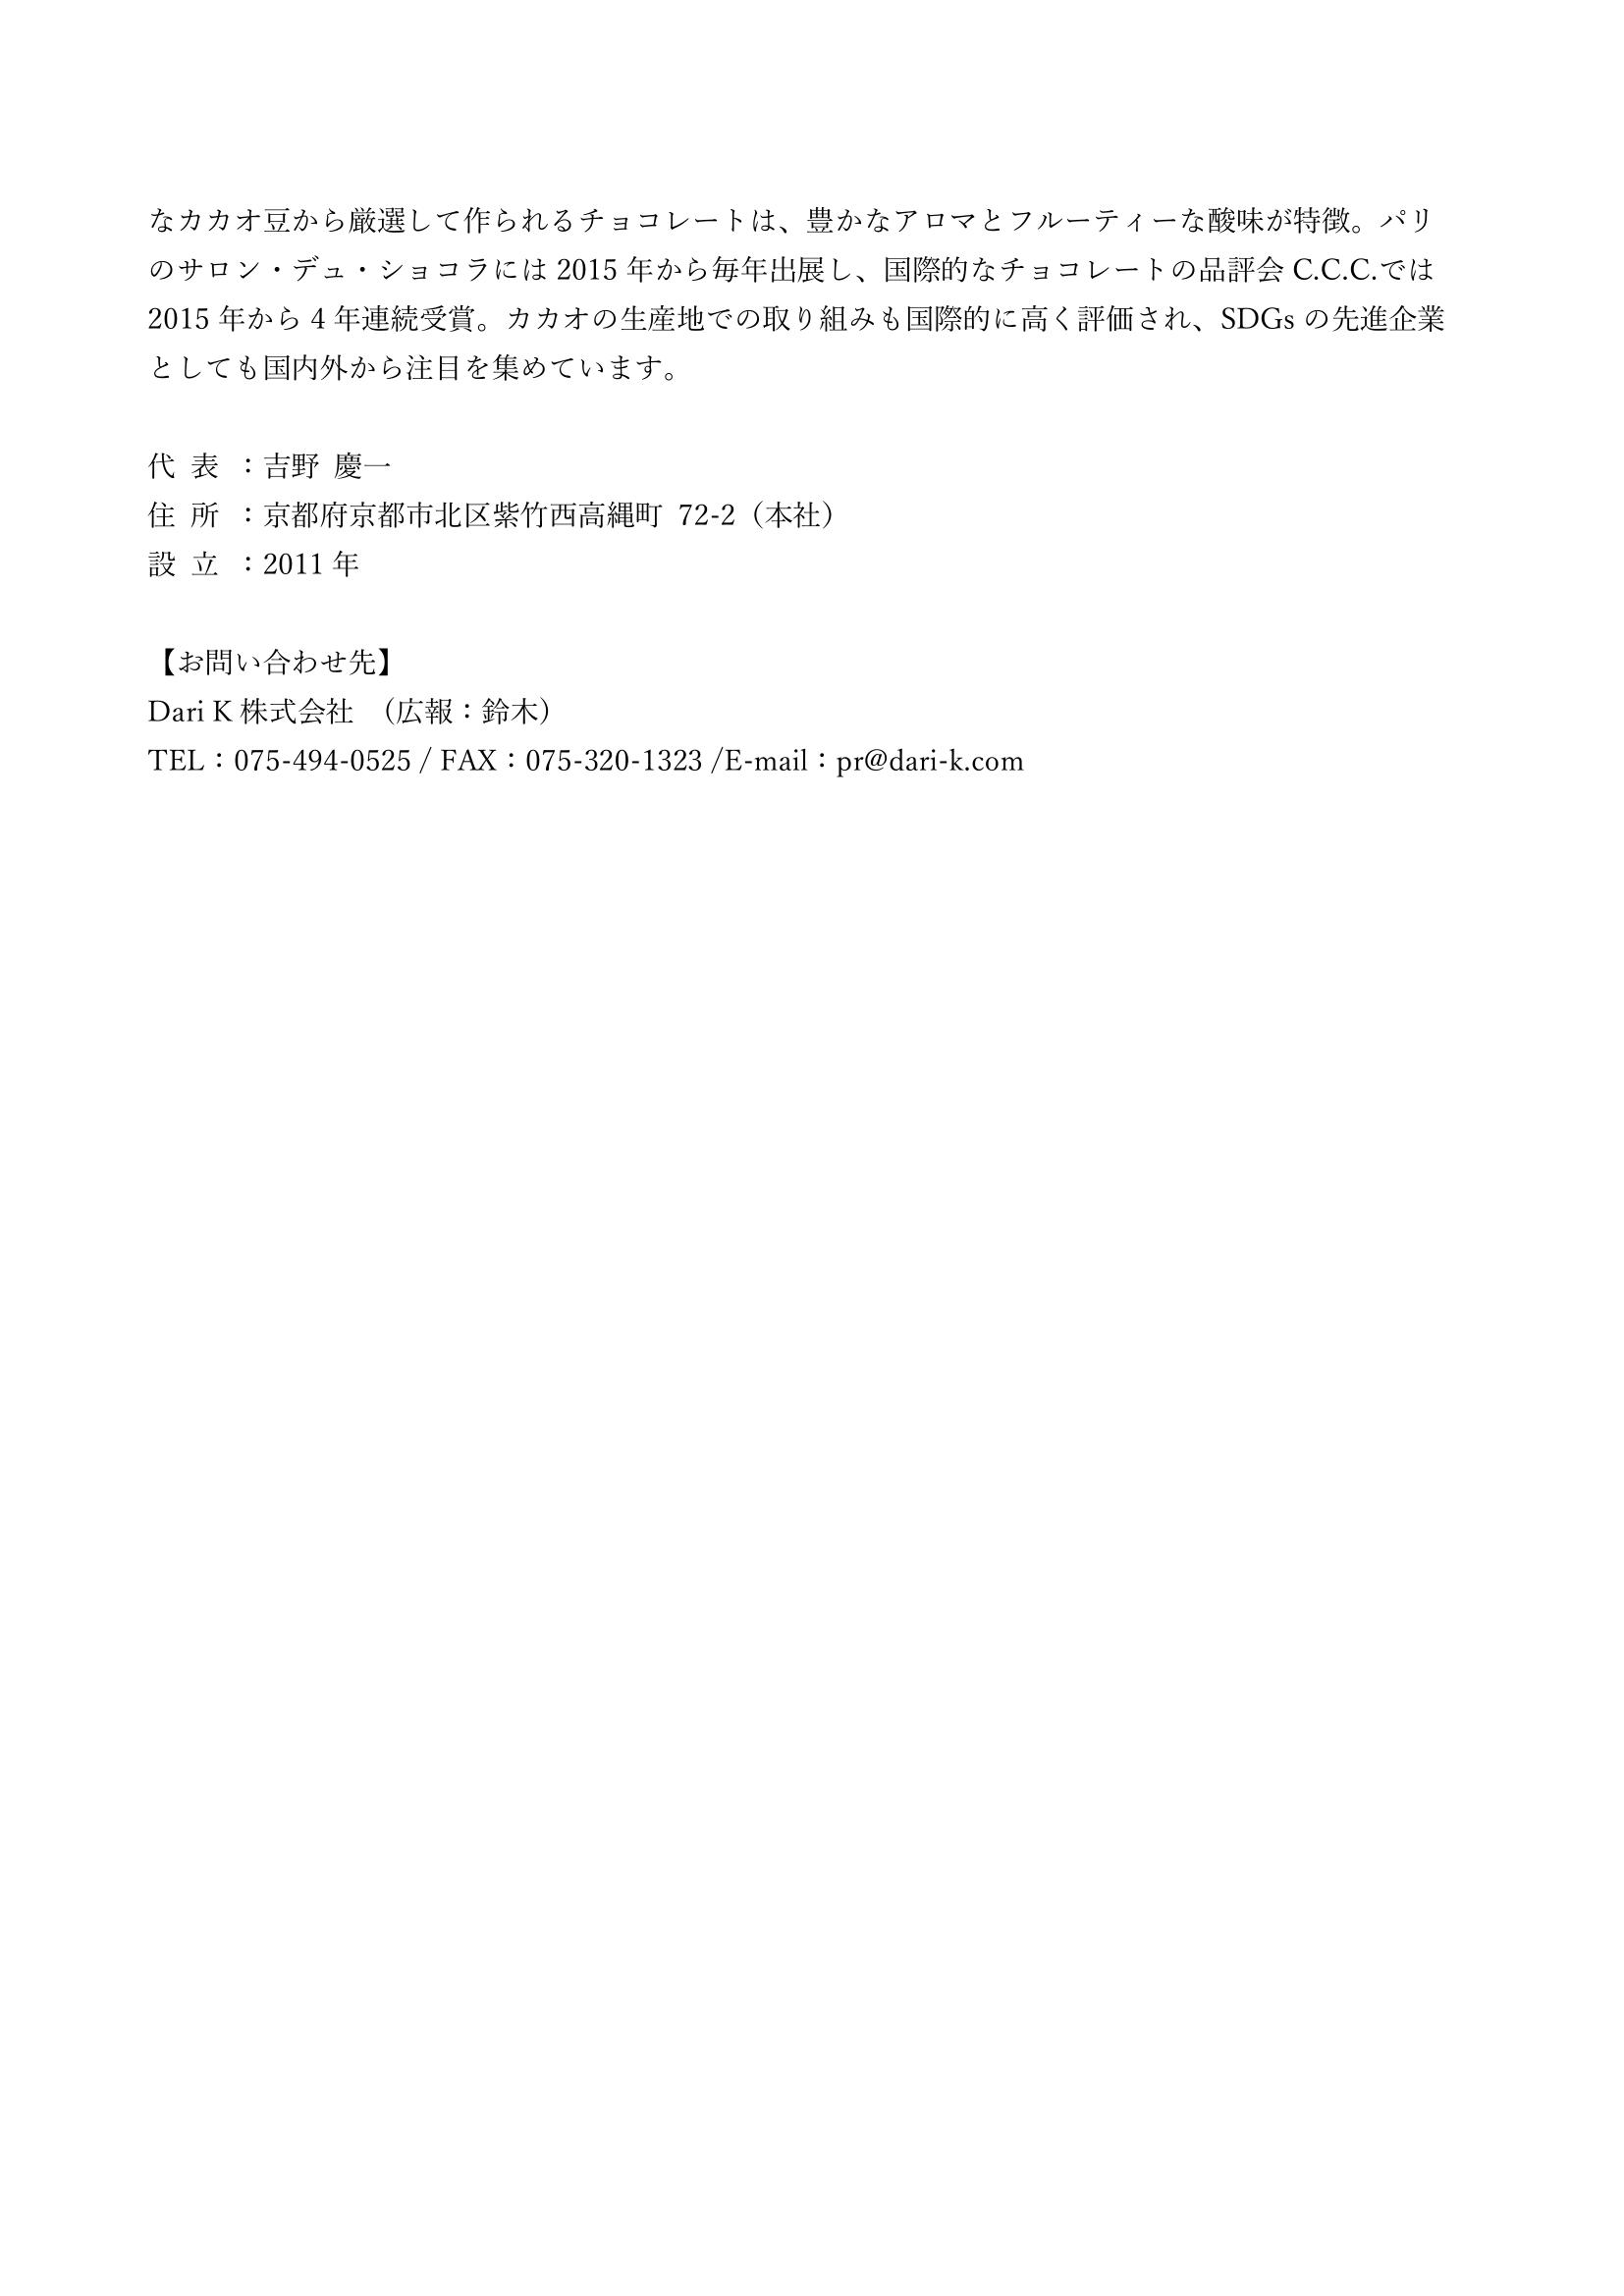 Dari_K_「十五夜トリュフ」プレスリリース(2021年9月14日)-3[1]